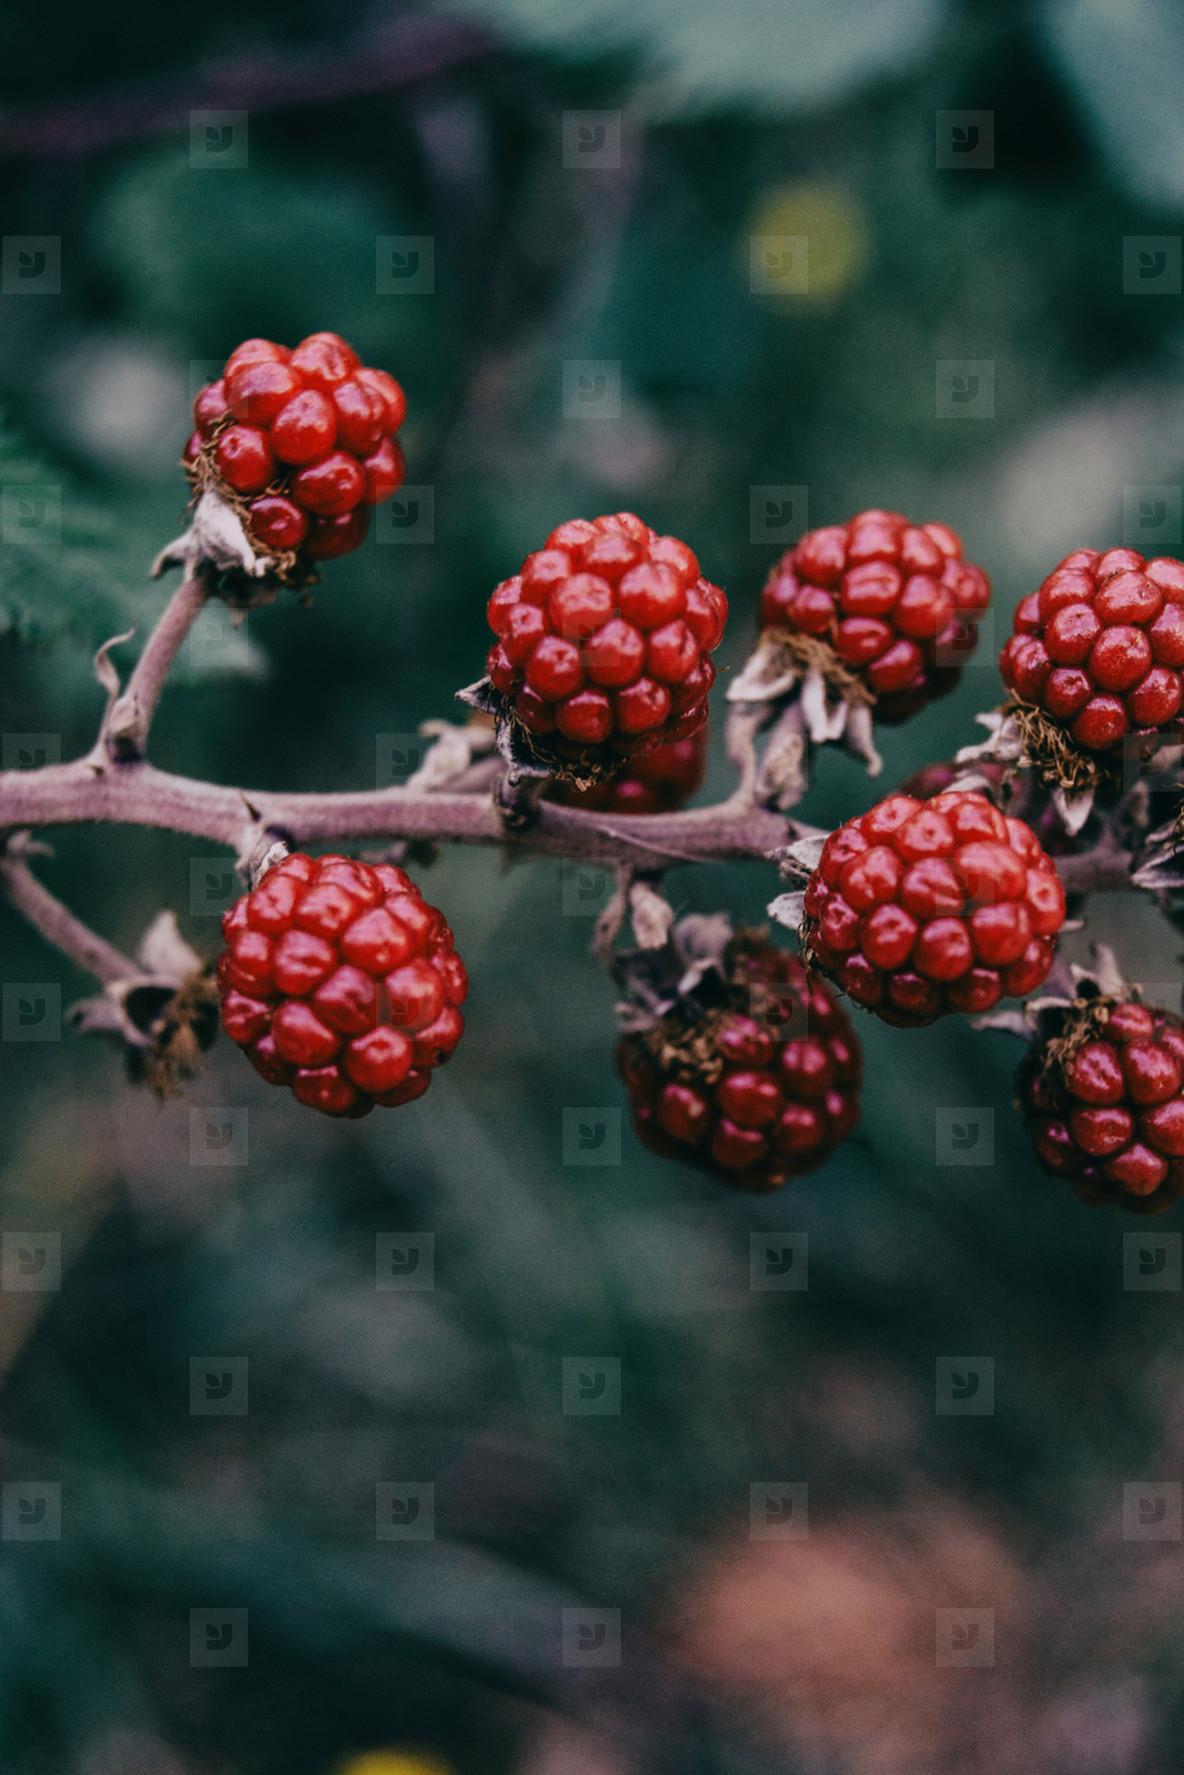 edible red berries of rubus in a field